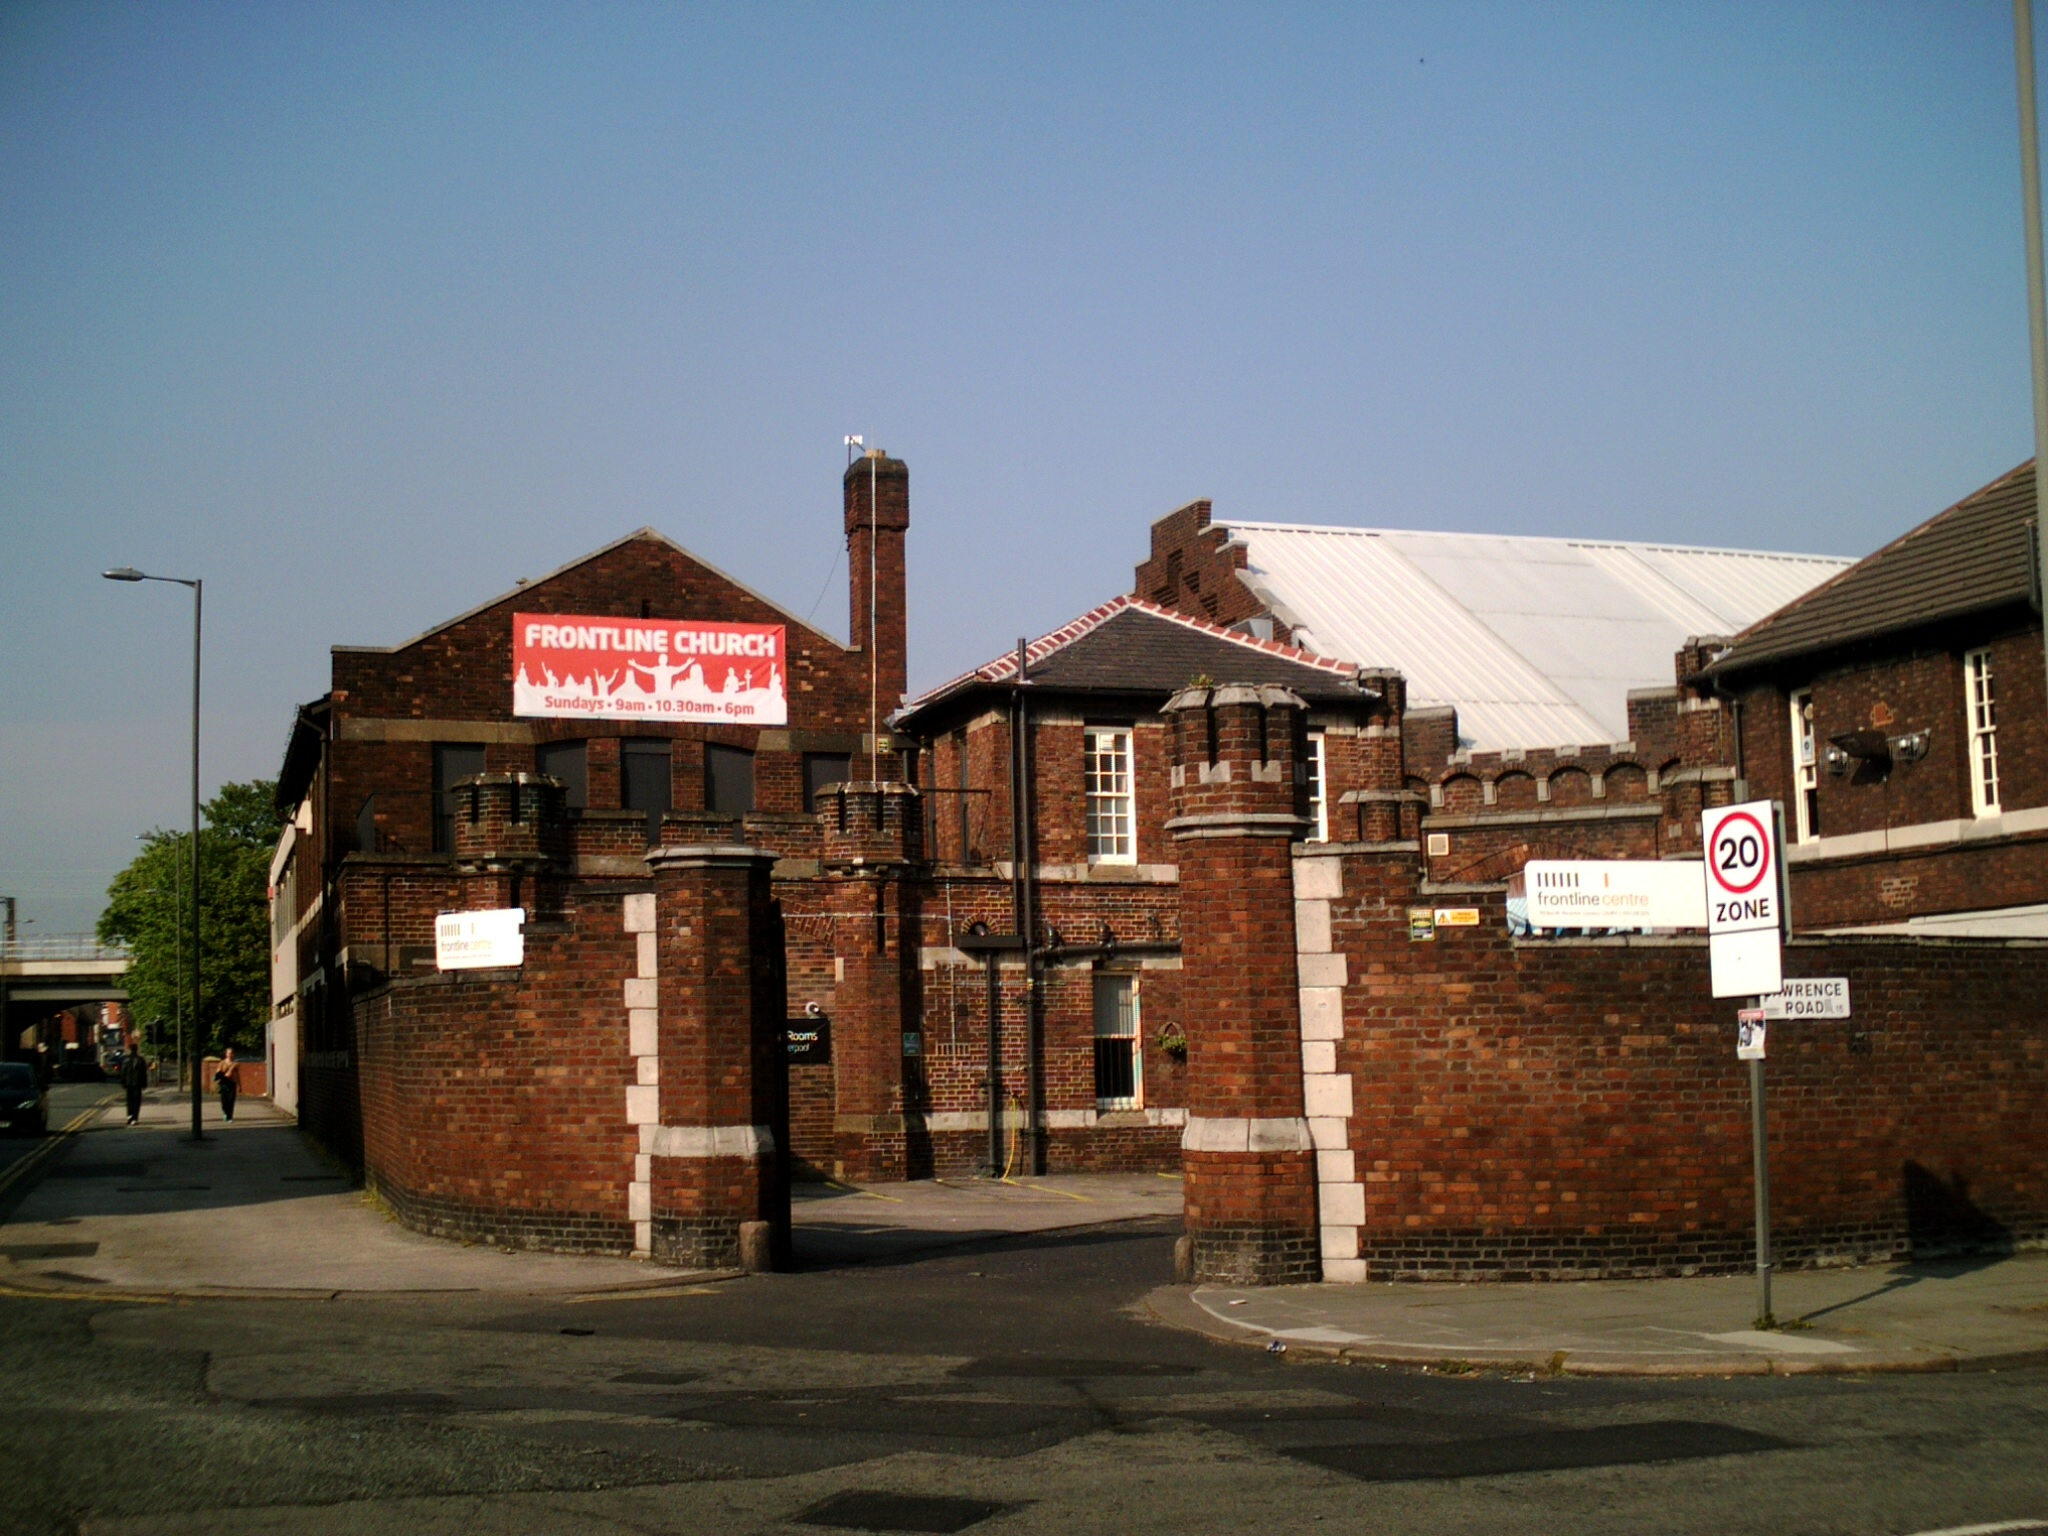 File:Frontline Church, Gainsborough Road.jpg - Wikimedia Commons